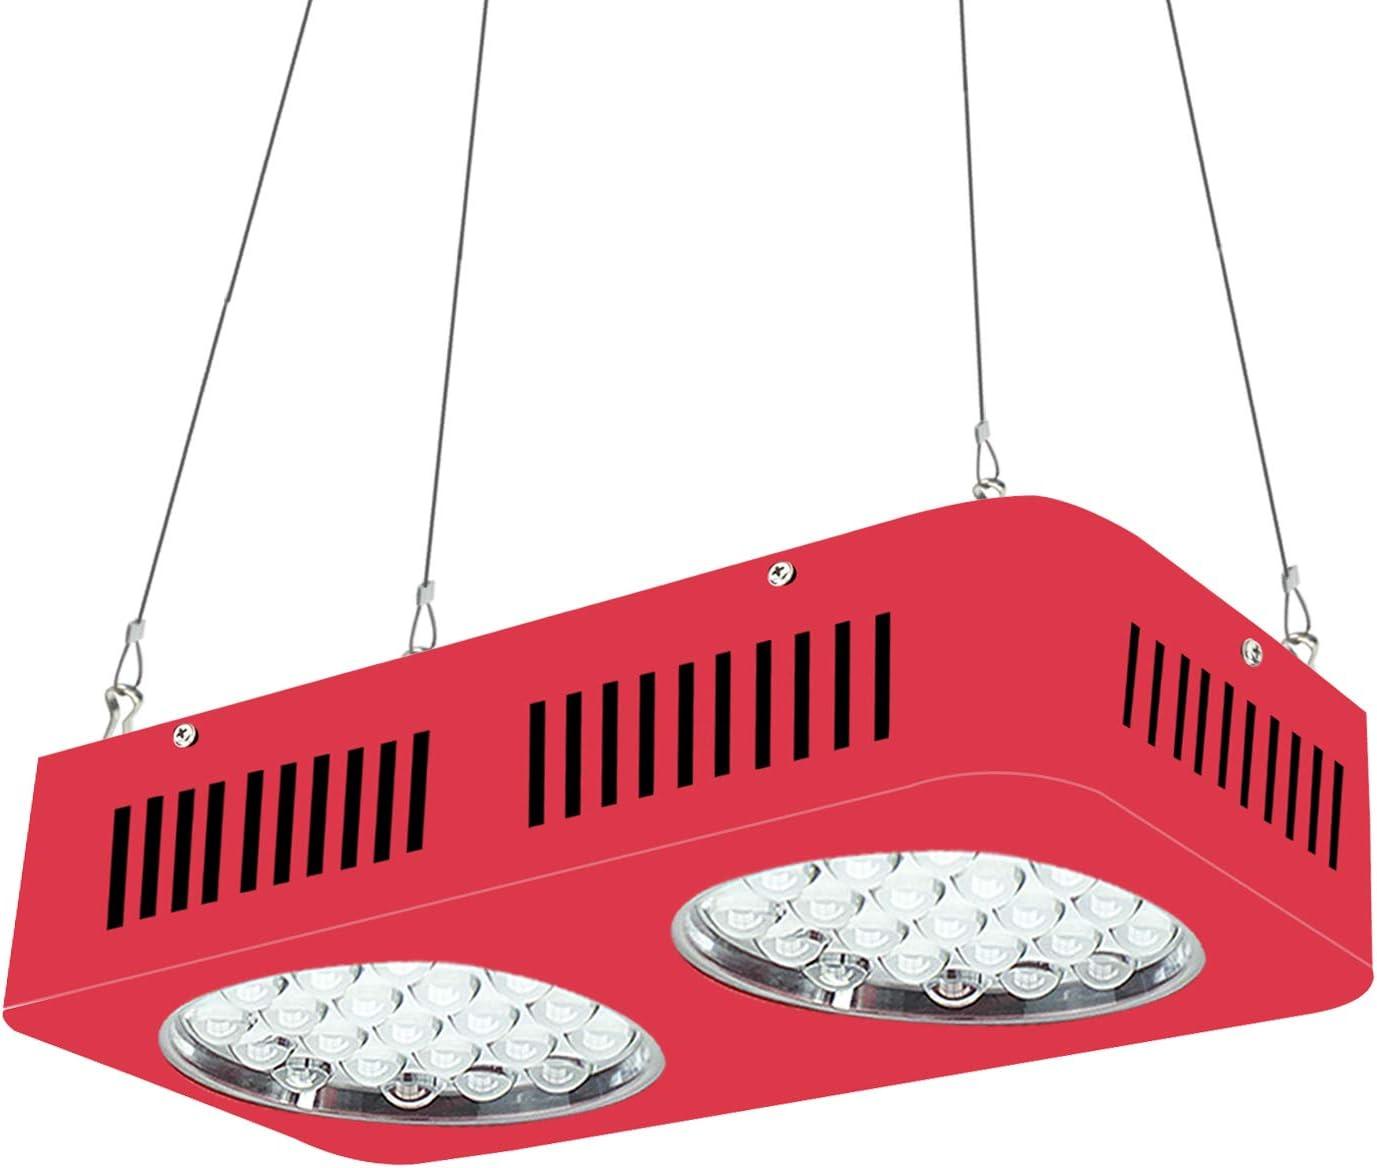 WYZM Lámpara de Planta LED, lámpara de Cultivo ZNTE2, Equivalente a 500 W HPS, Espectro Completo Profesional, diseño Especial para Sistemas de Cultivo de Interior. (ZNET2-500W)